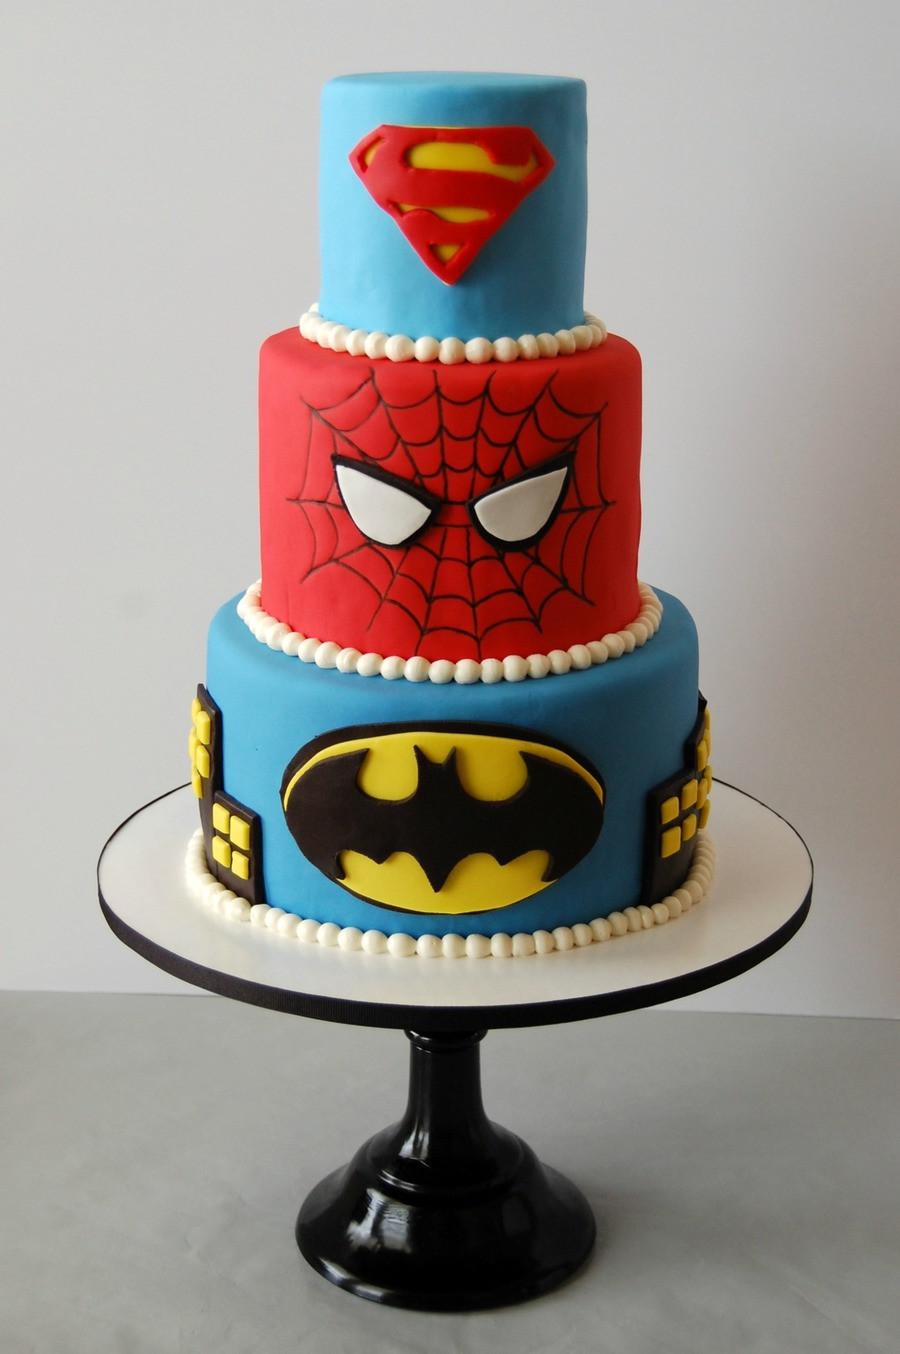 Best ideas about Superhero Birthday Cake . Save or Pin Superhero Birthday Cake CakeCentral Now.